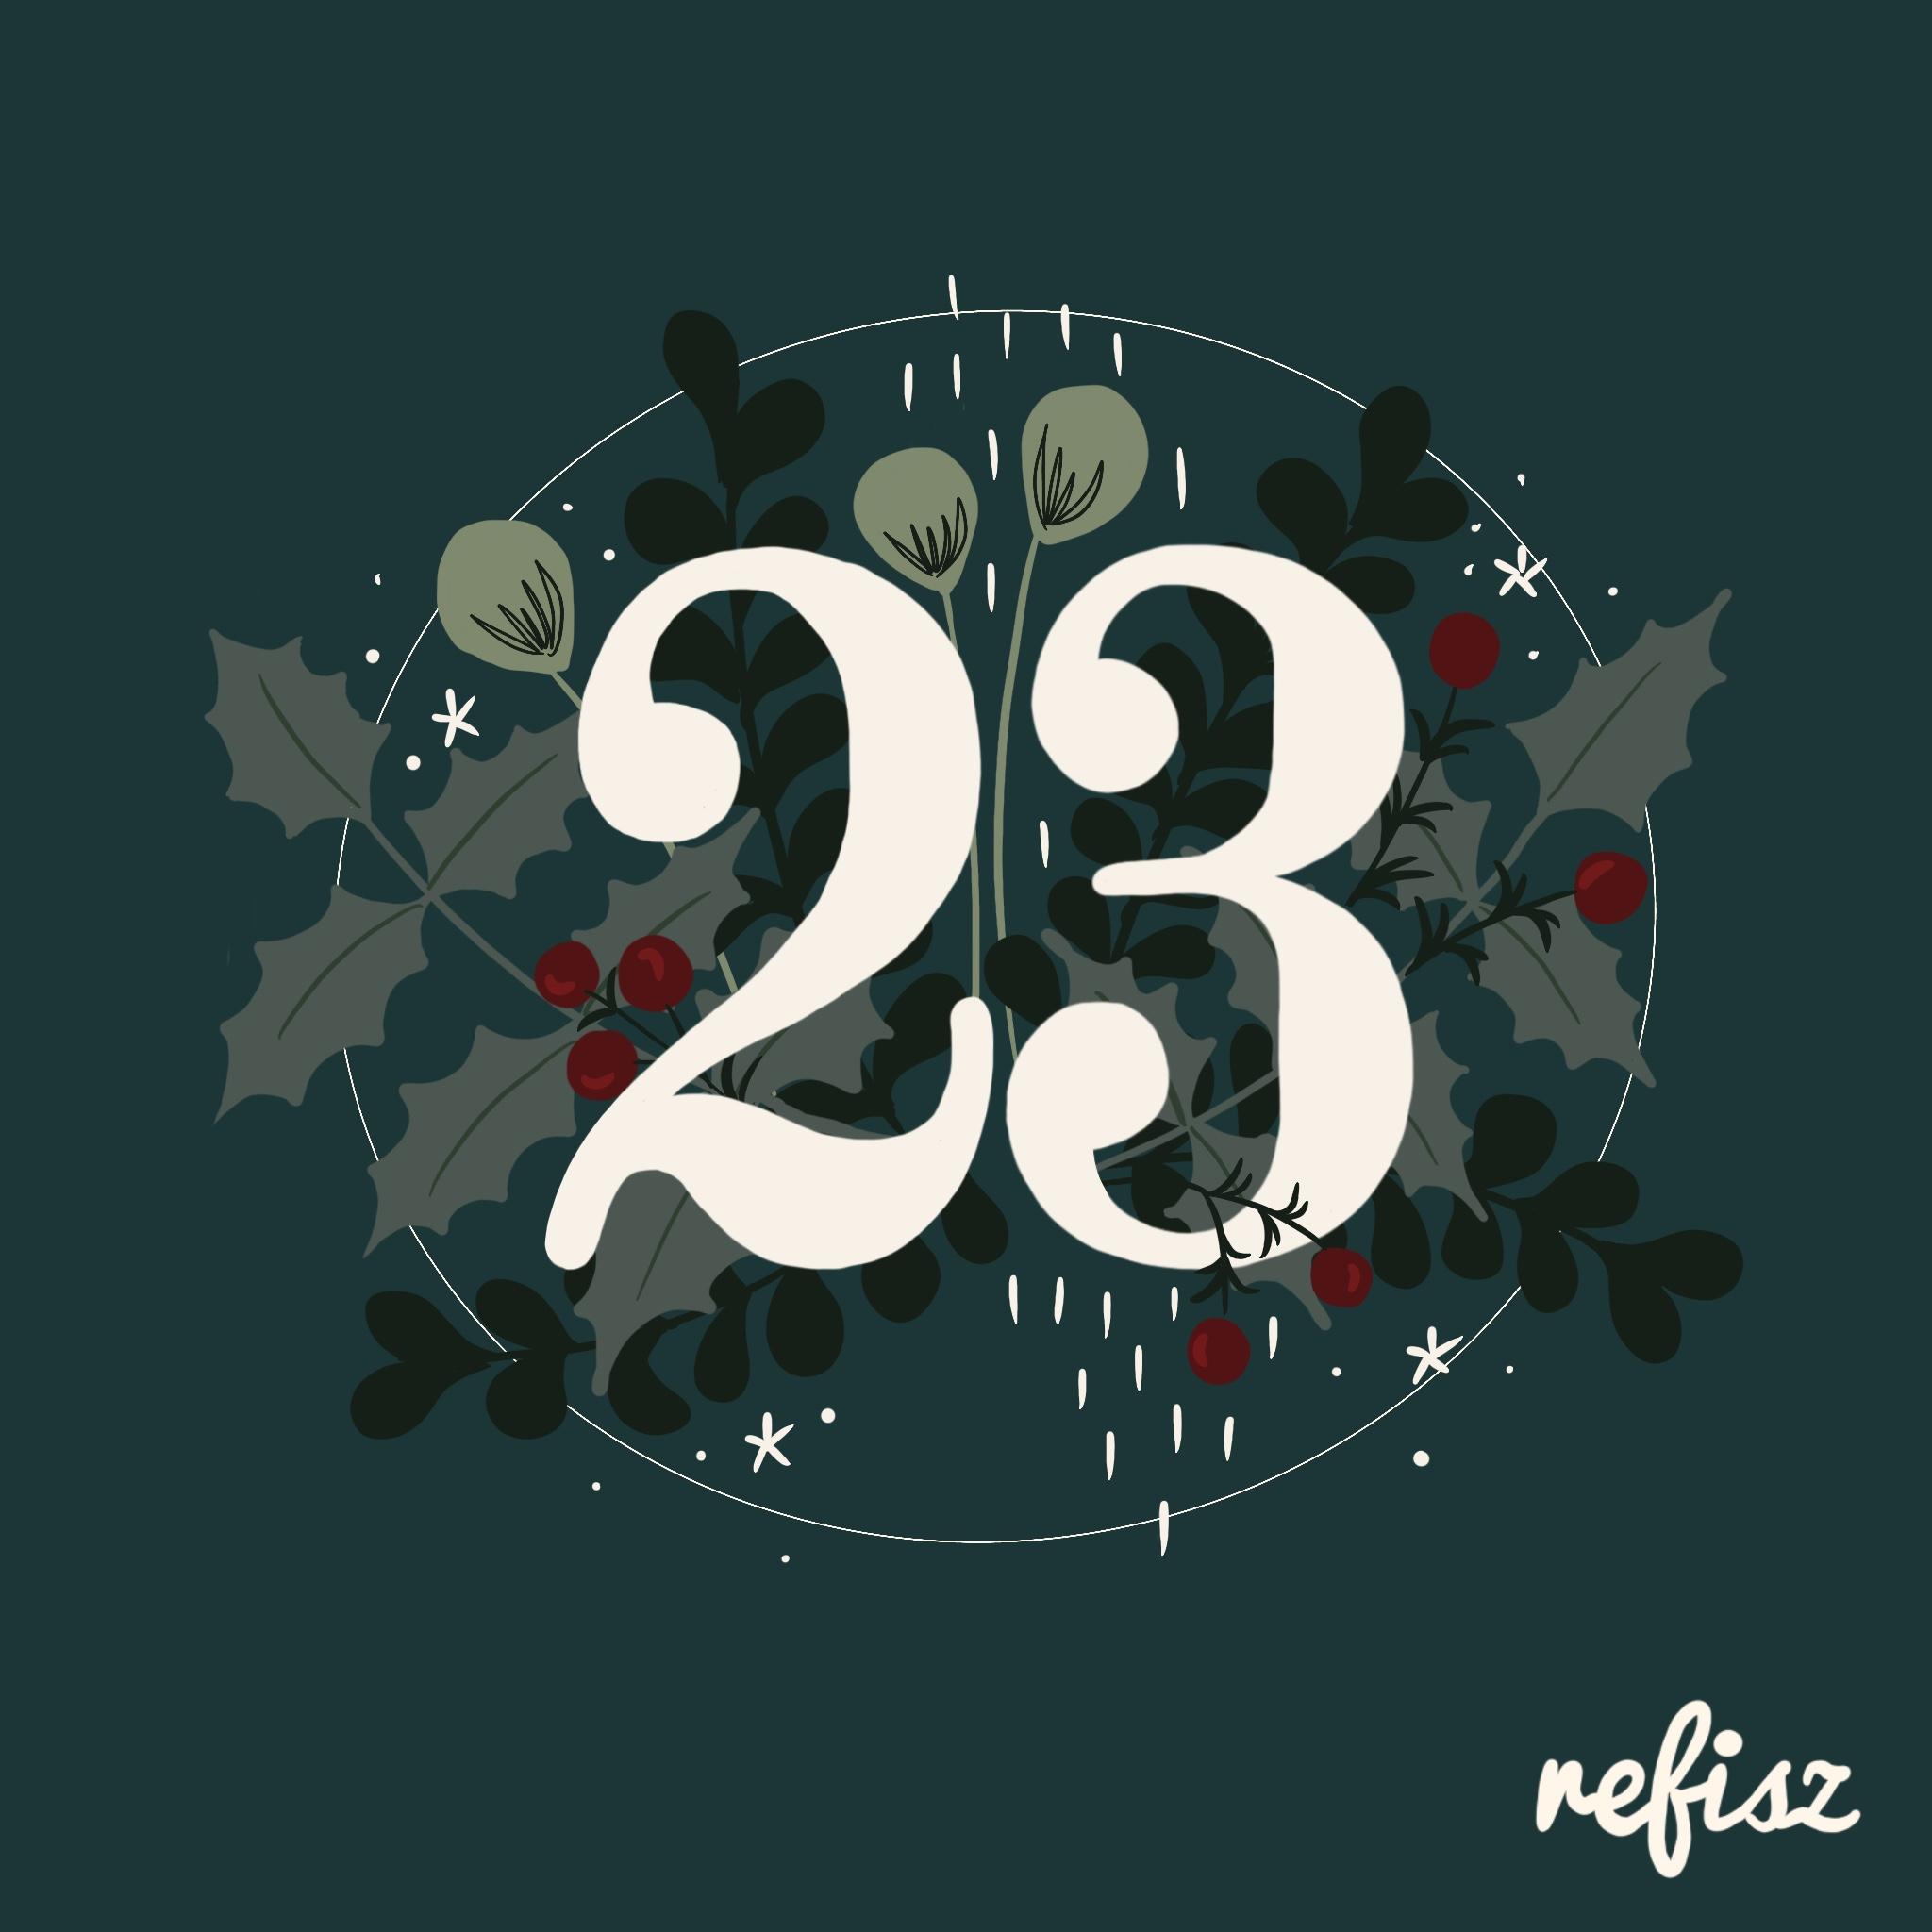 REFISZ Adventi Kalendárium 2020. december 23.